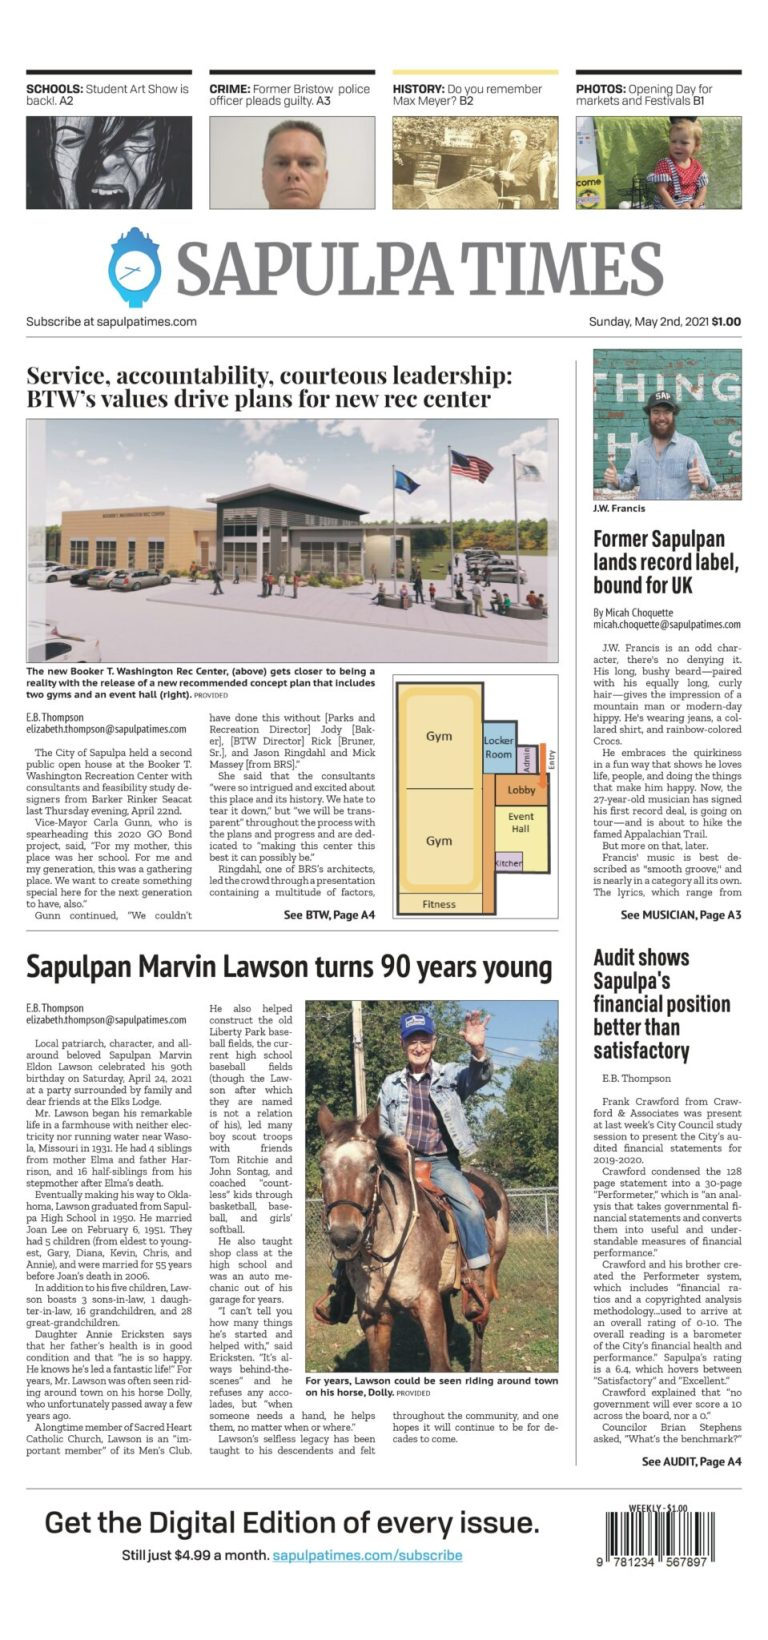 Sapulpa Times Digital Edition 05/02/2021